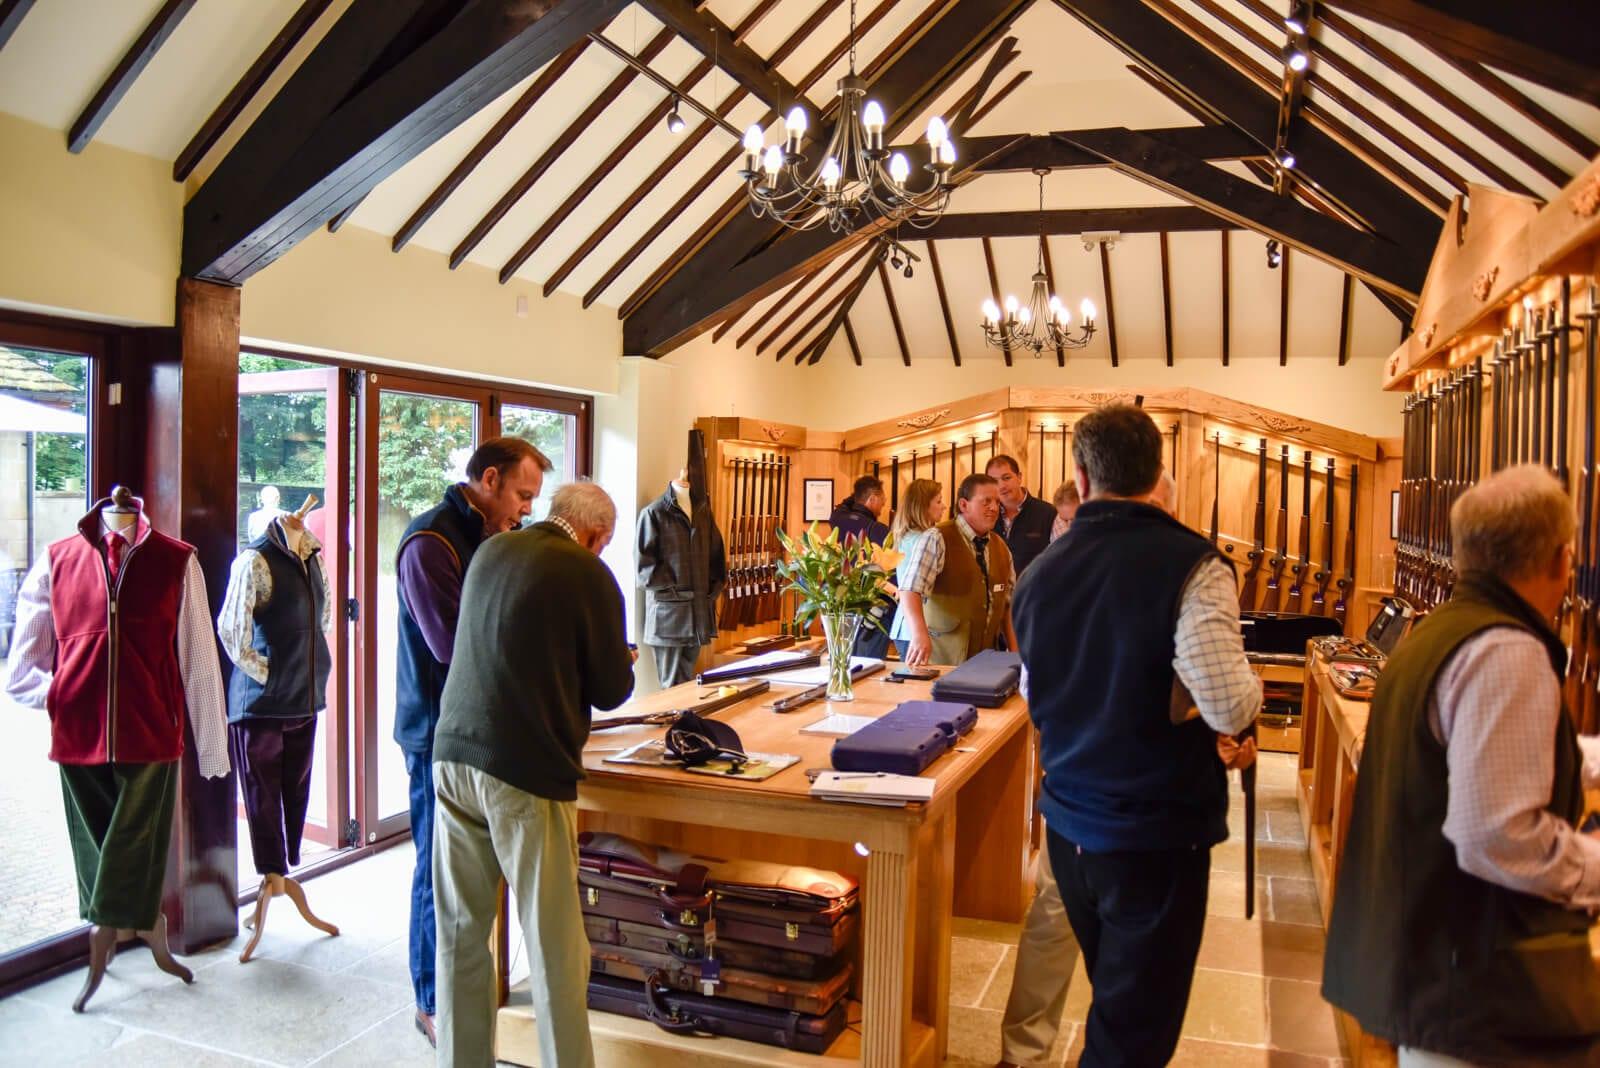 Customers browsing the Sportarm at Lady's Wood gun shop